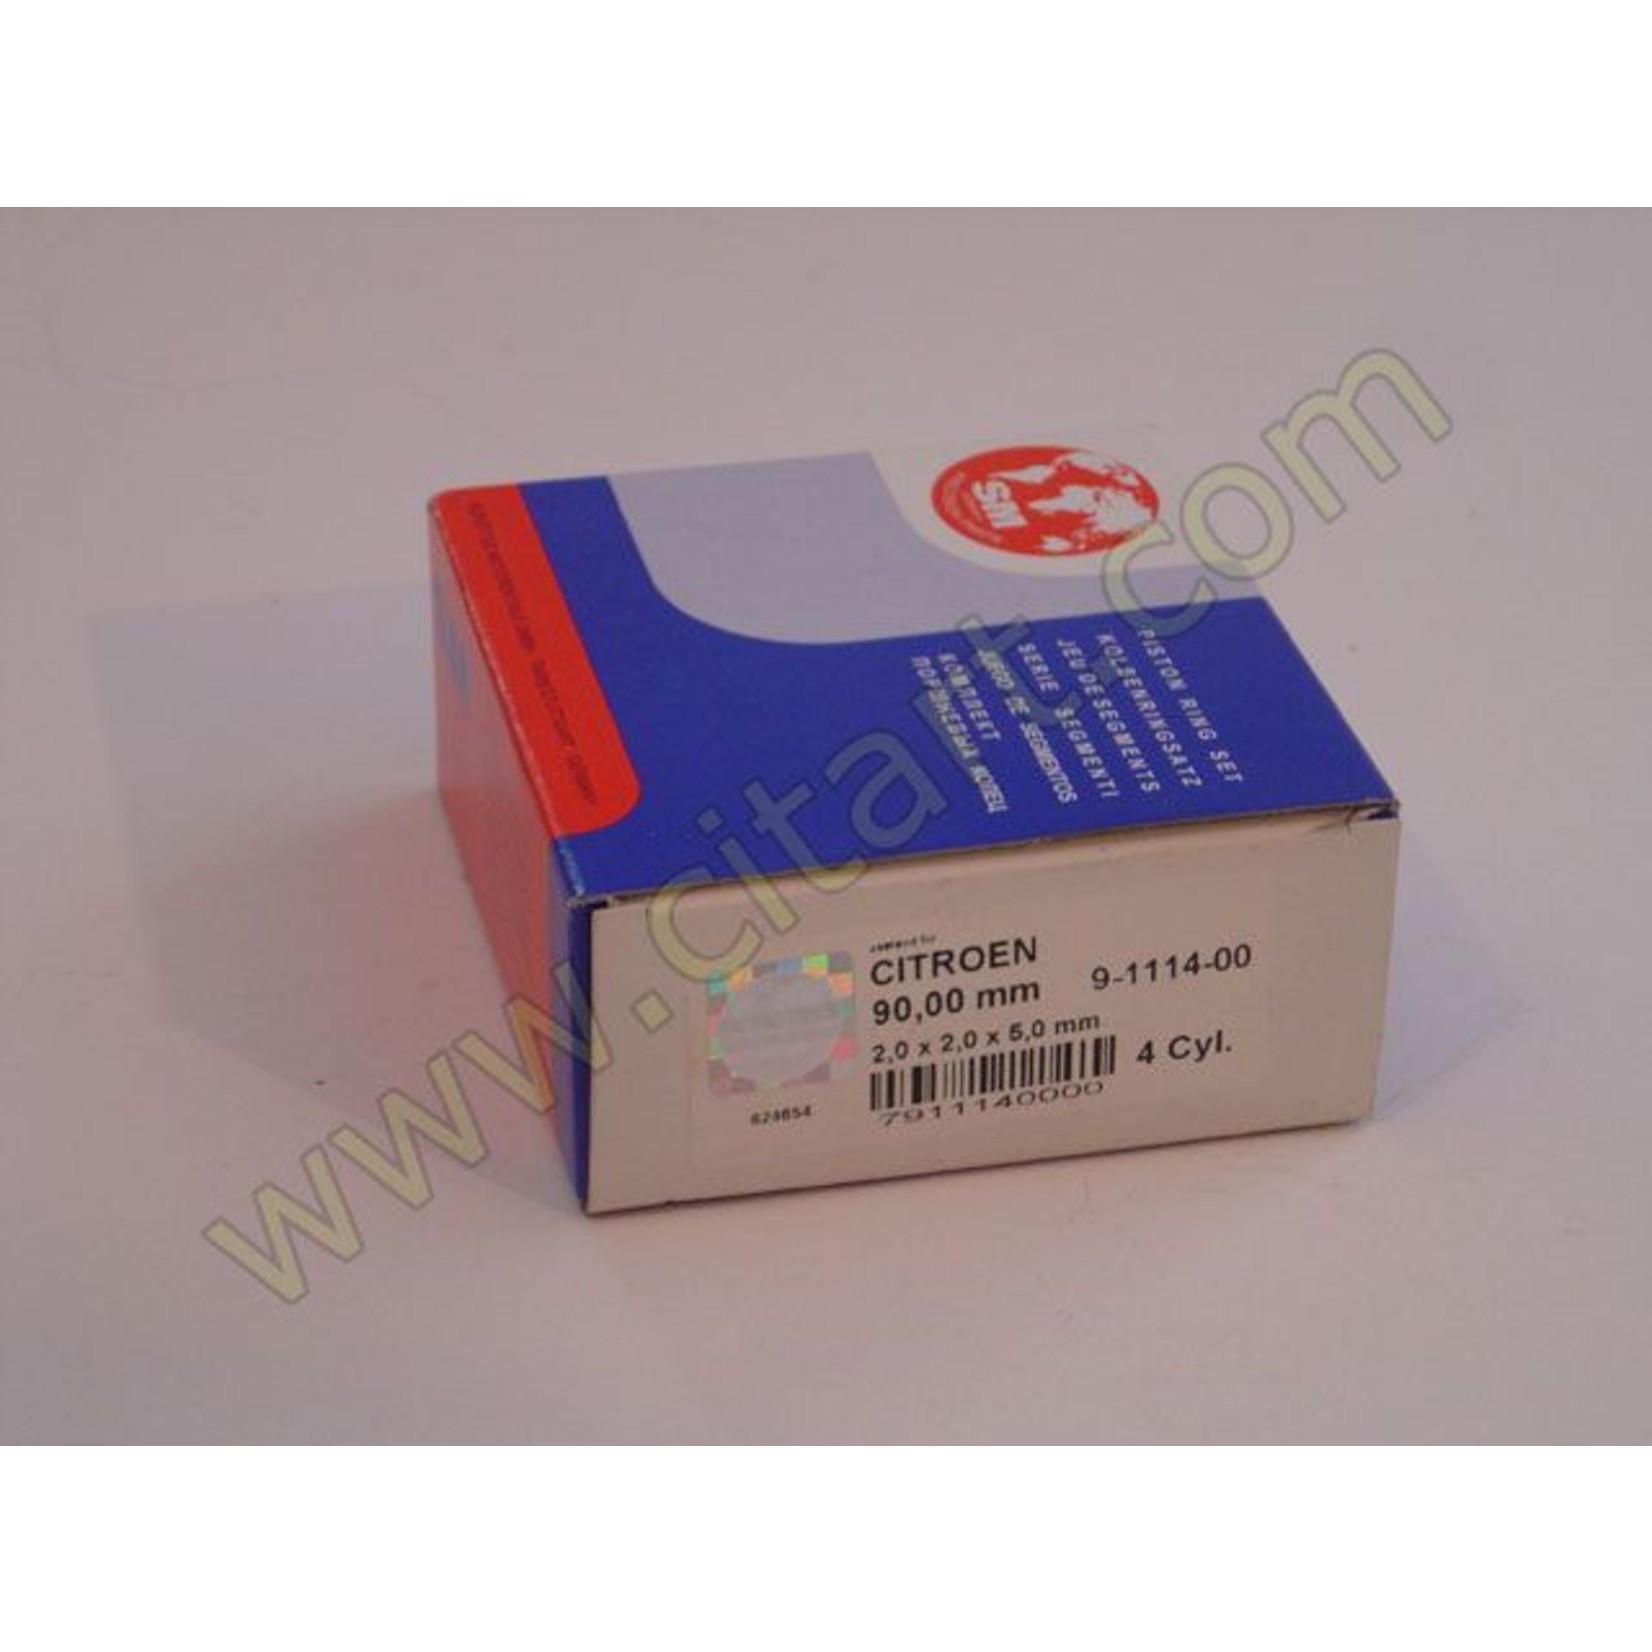 Piston rings 90mm Nr Org: 5438078